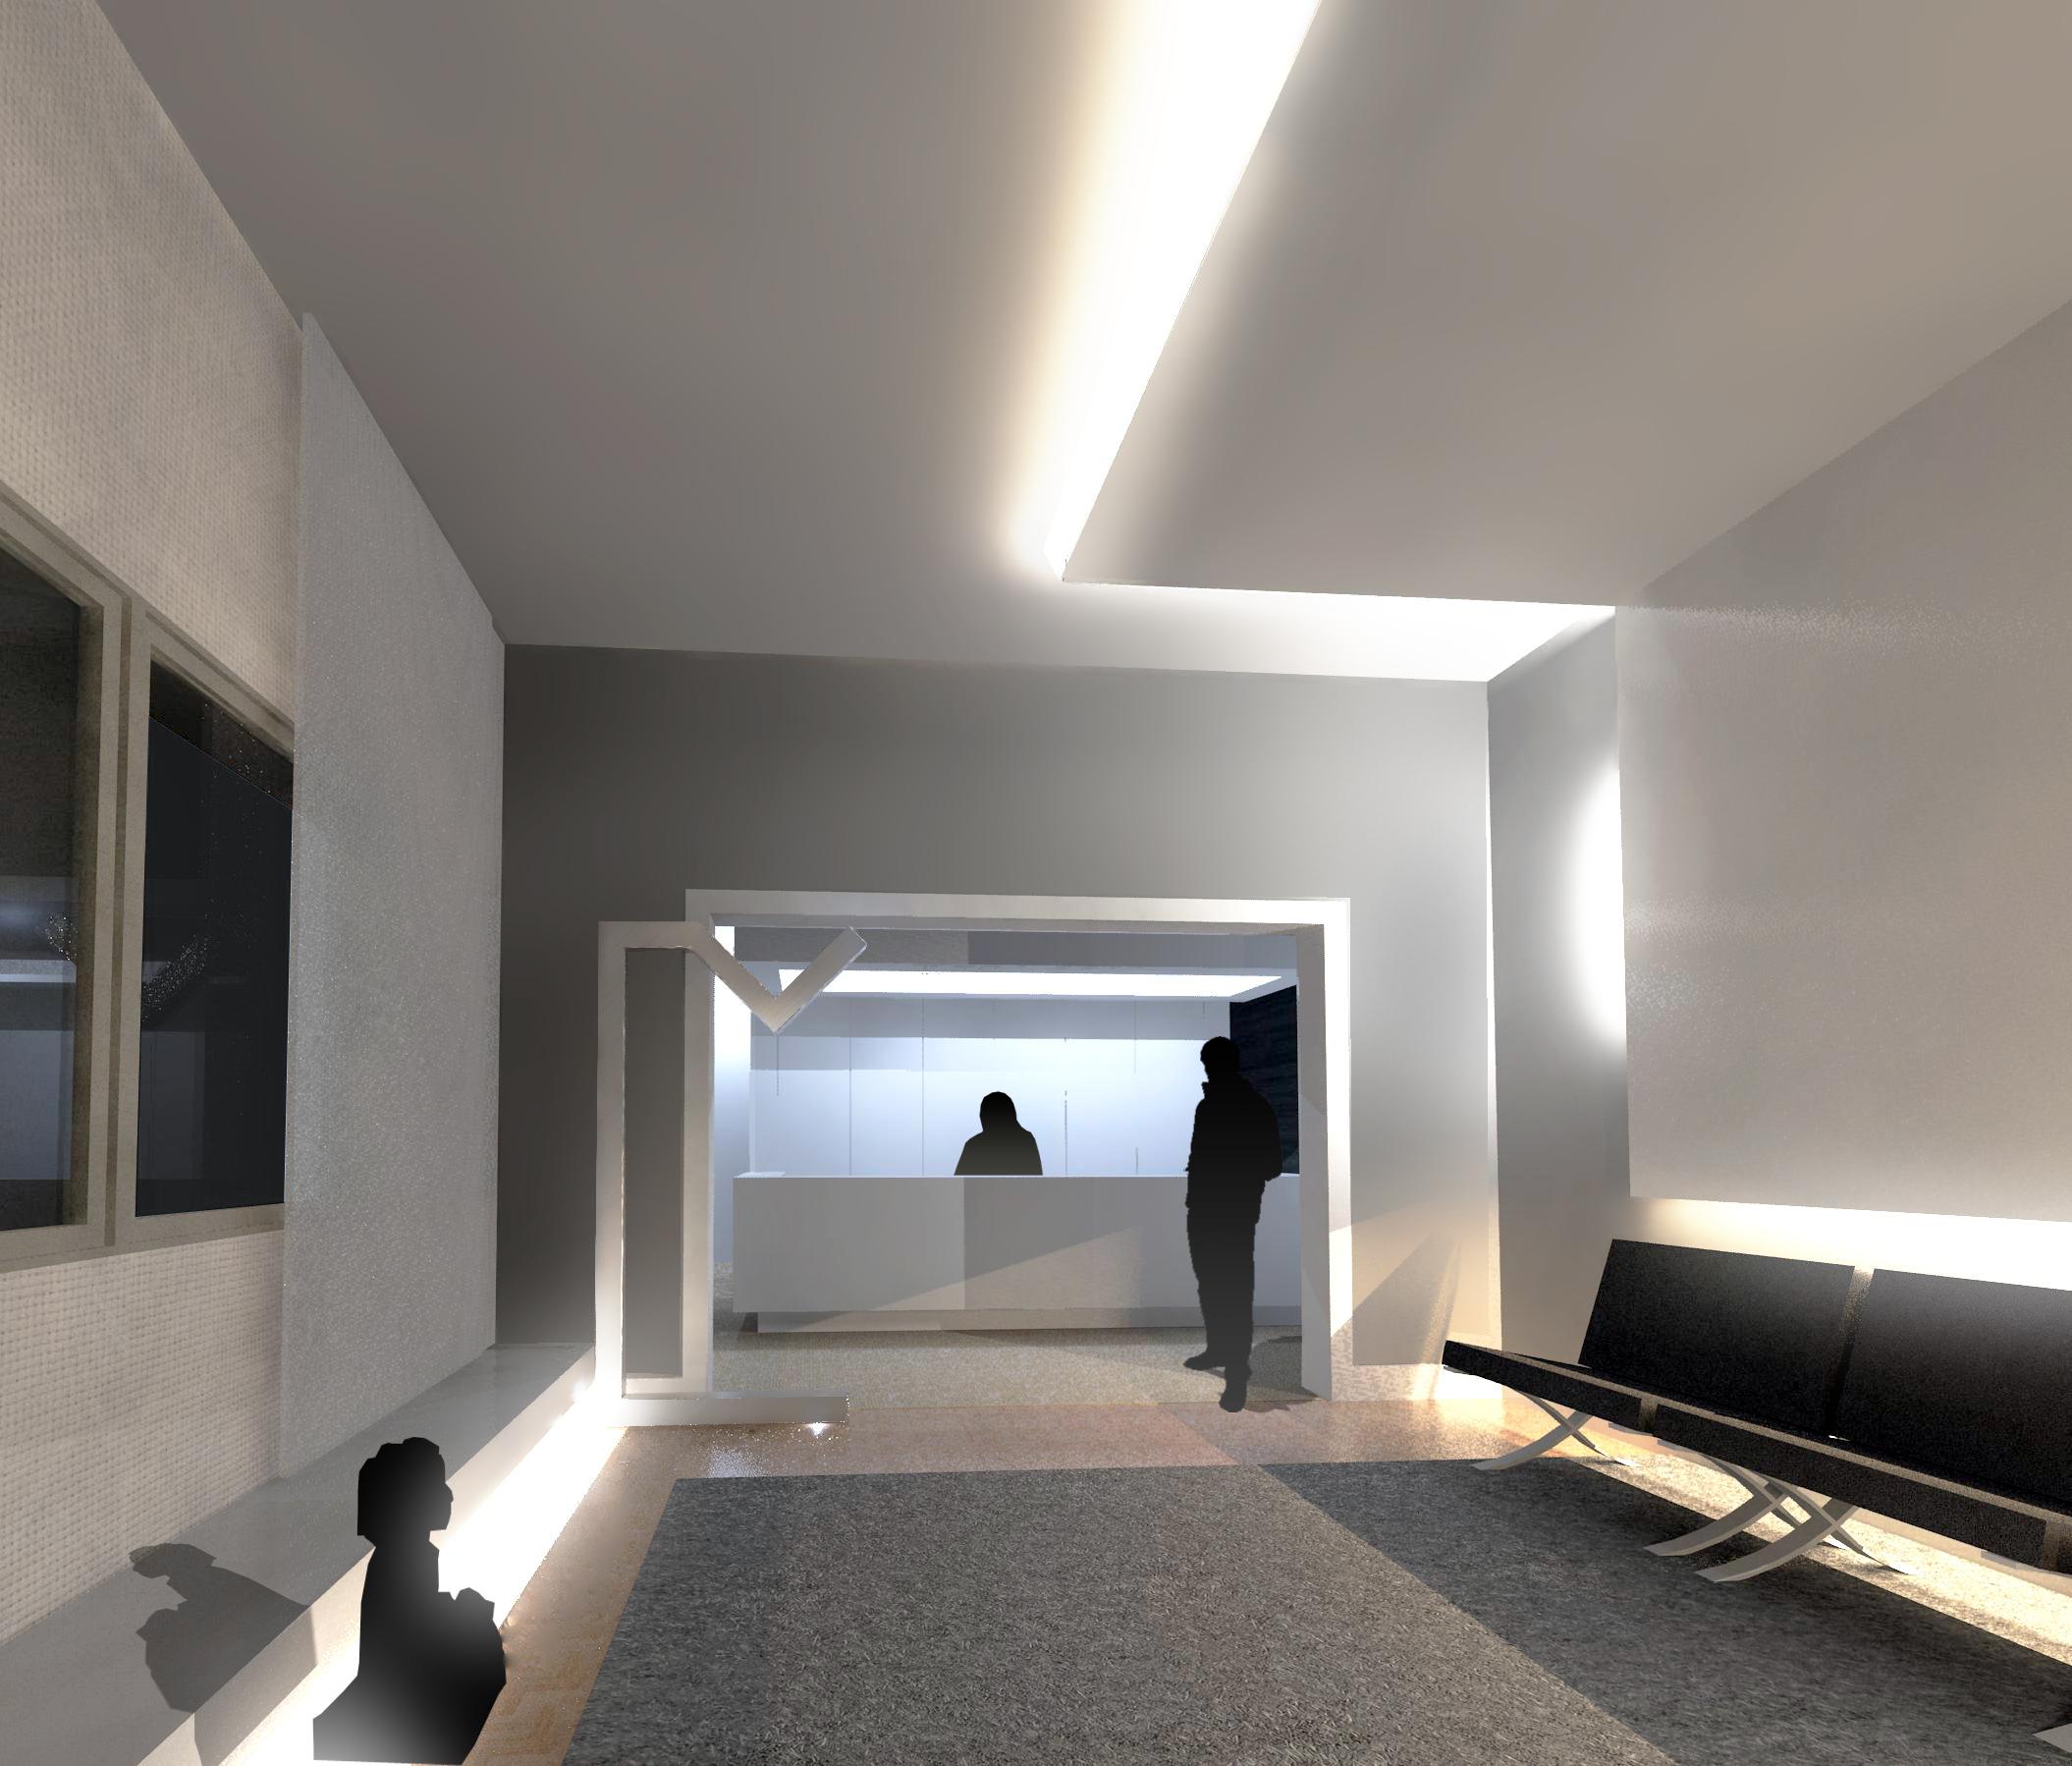 sala espera1.jpg